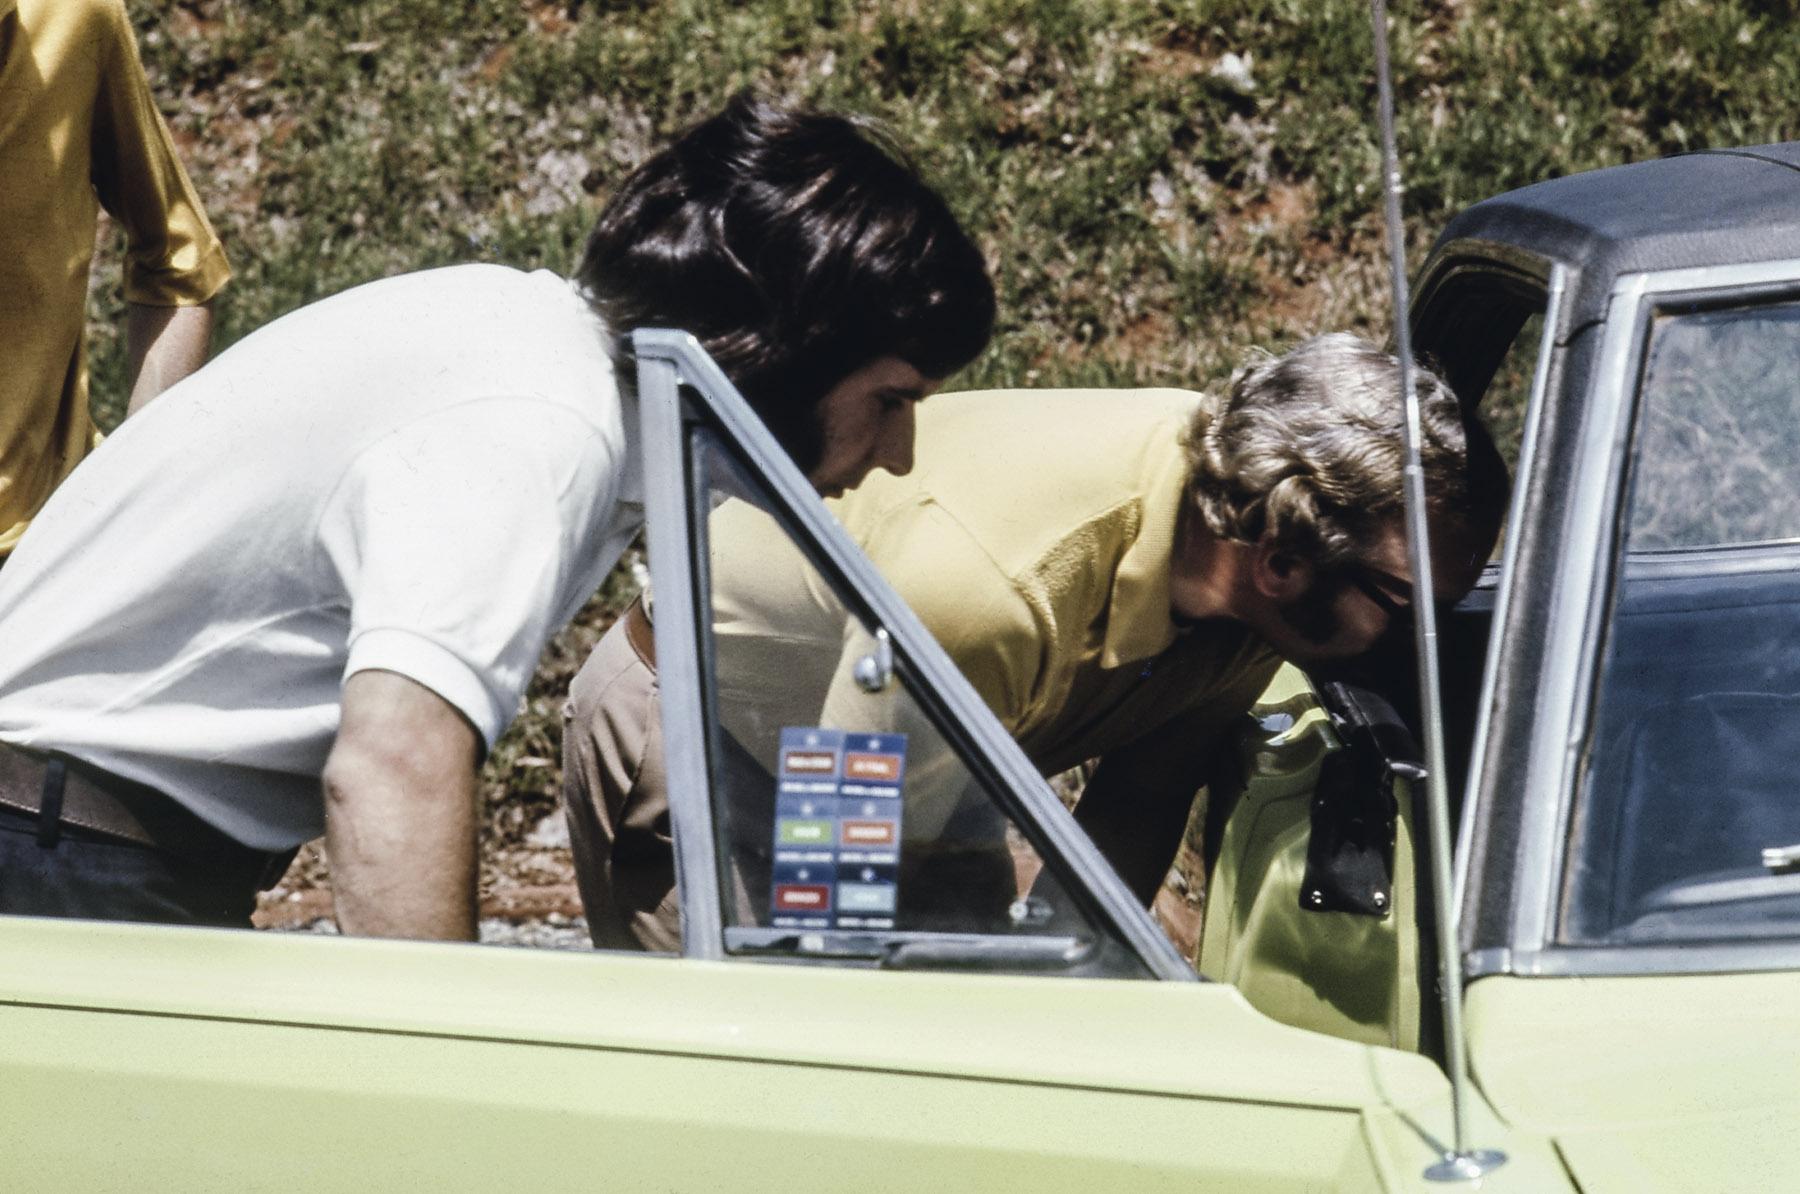 Emerson Fittipaldi e Colin Chapman: os campeões testaram seis carros brasileiros: Puma, Opala S, VW TL, Charger RT, Corcel GT e o Landau